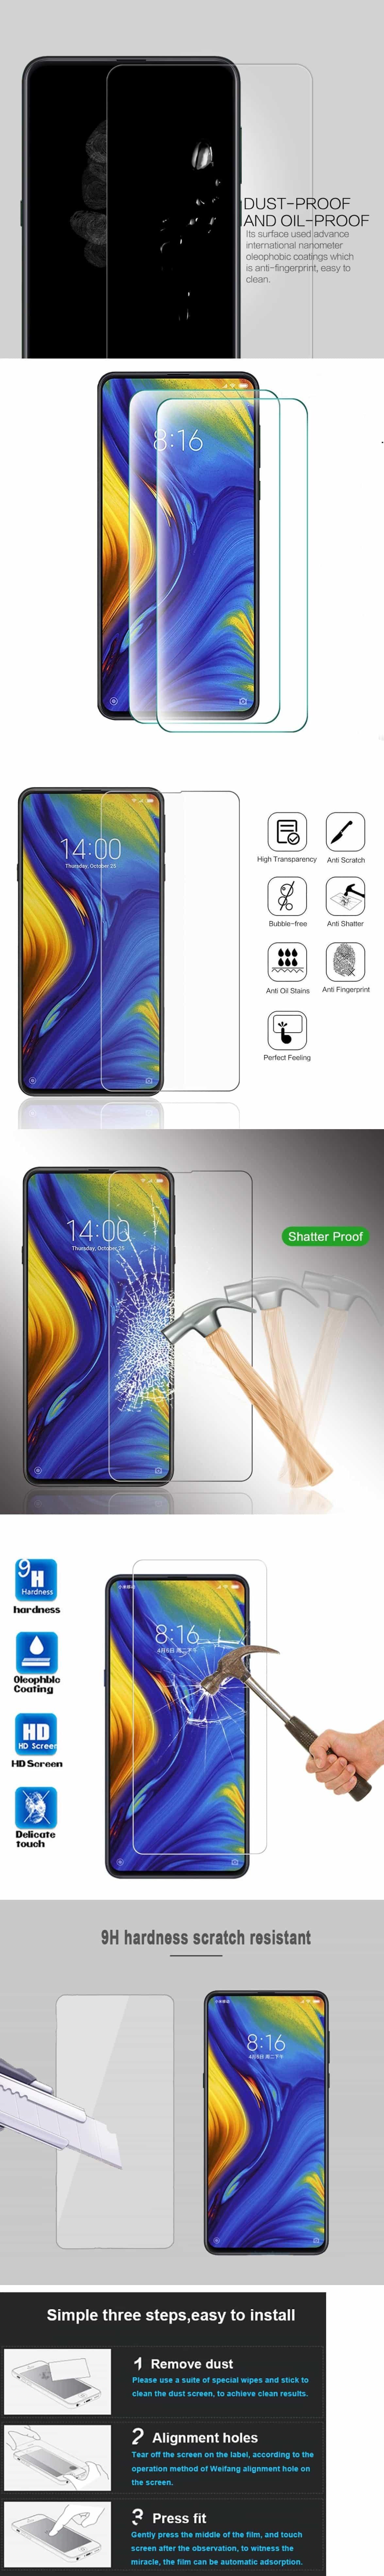 Prezentare-Folie-sticla-Xiaomi-Mi-Mix-3-5Gbdfb74be4e5eb922.jpg